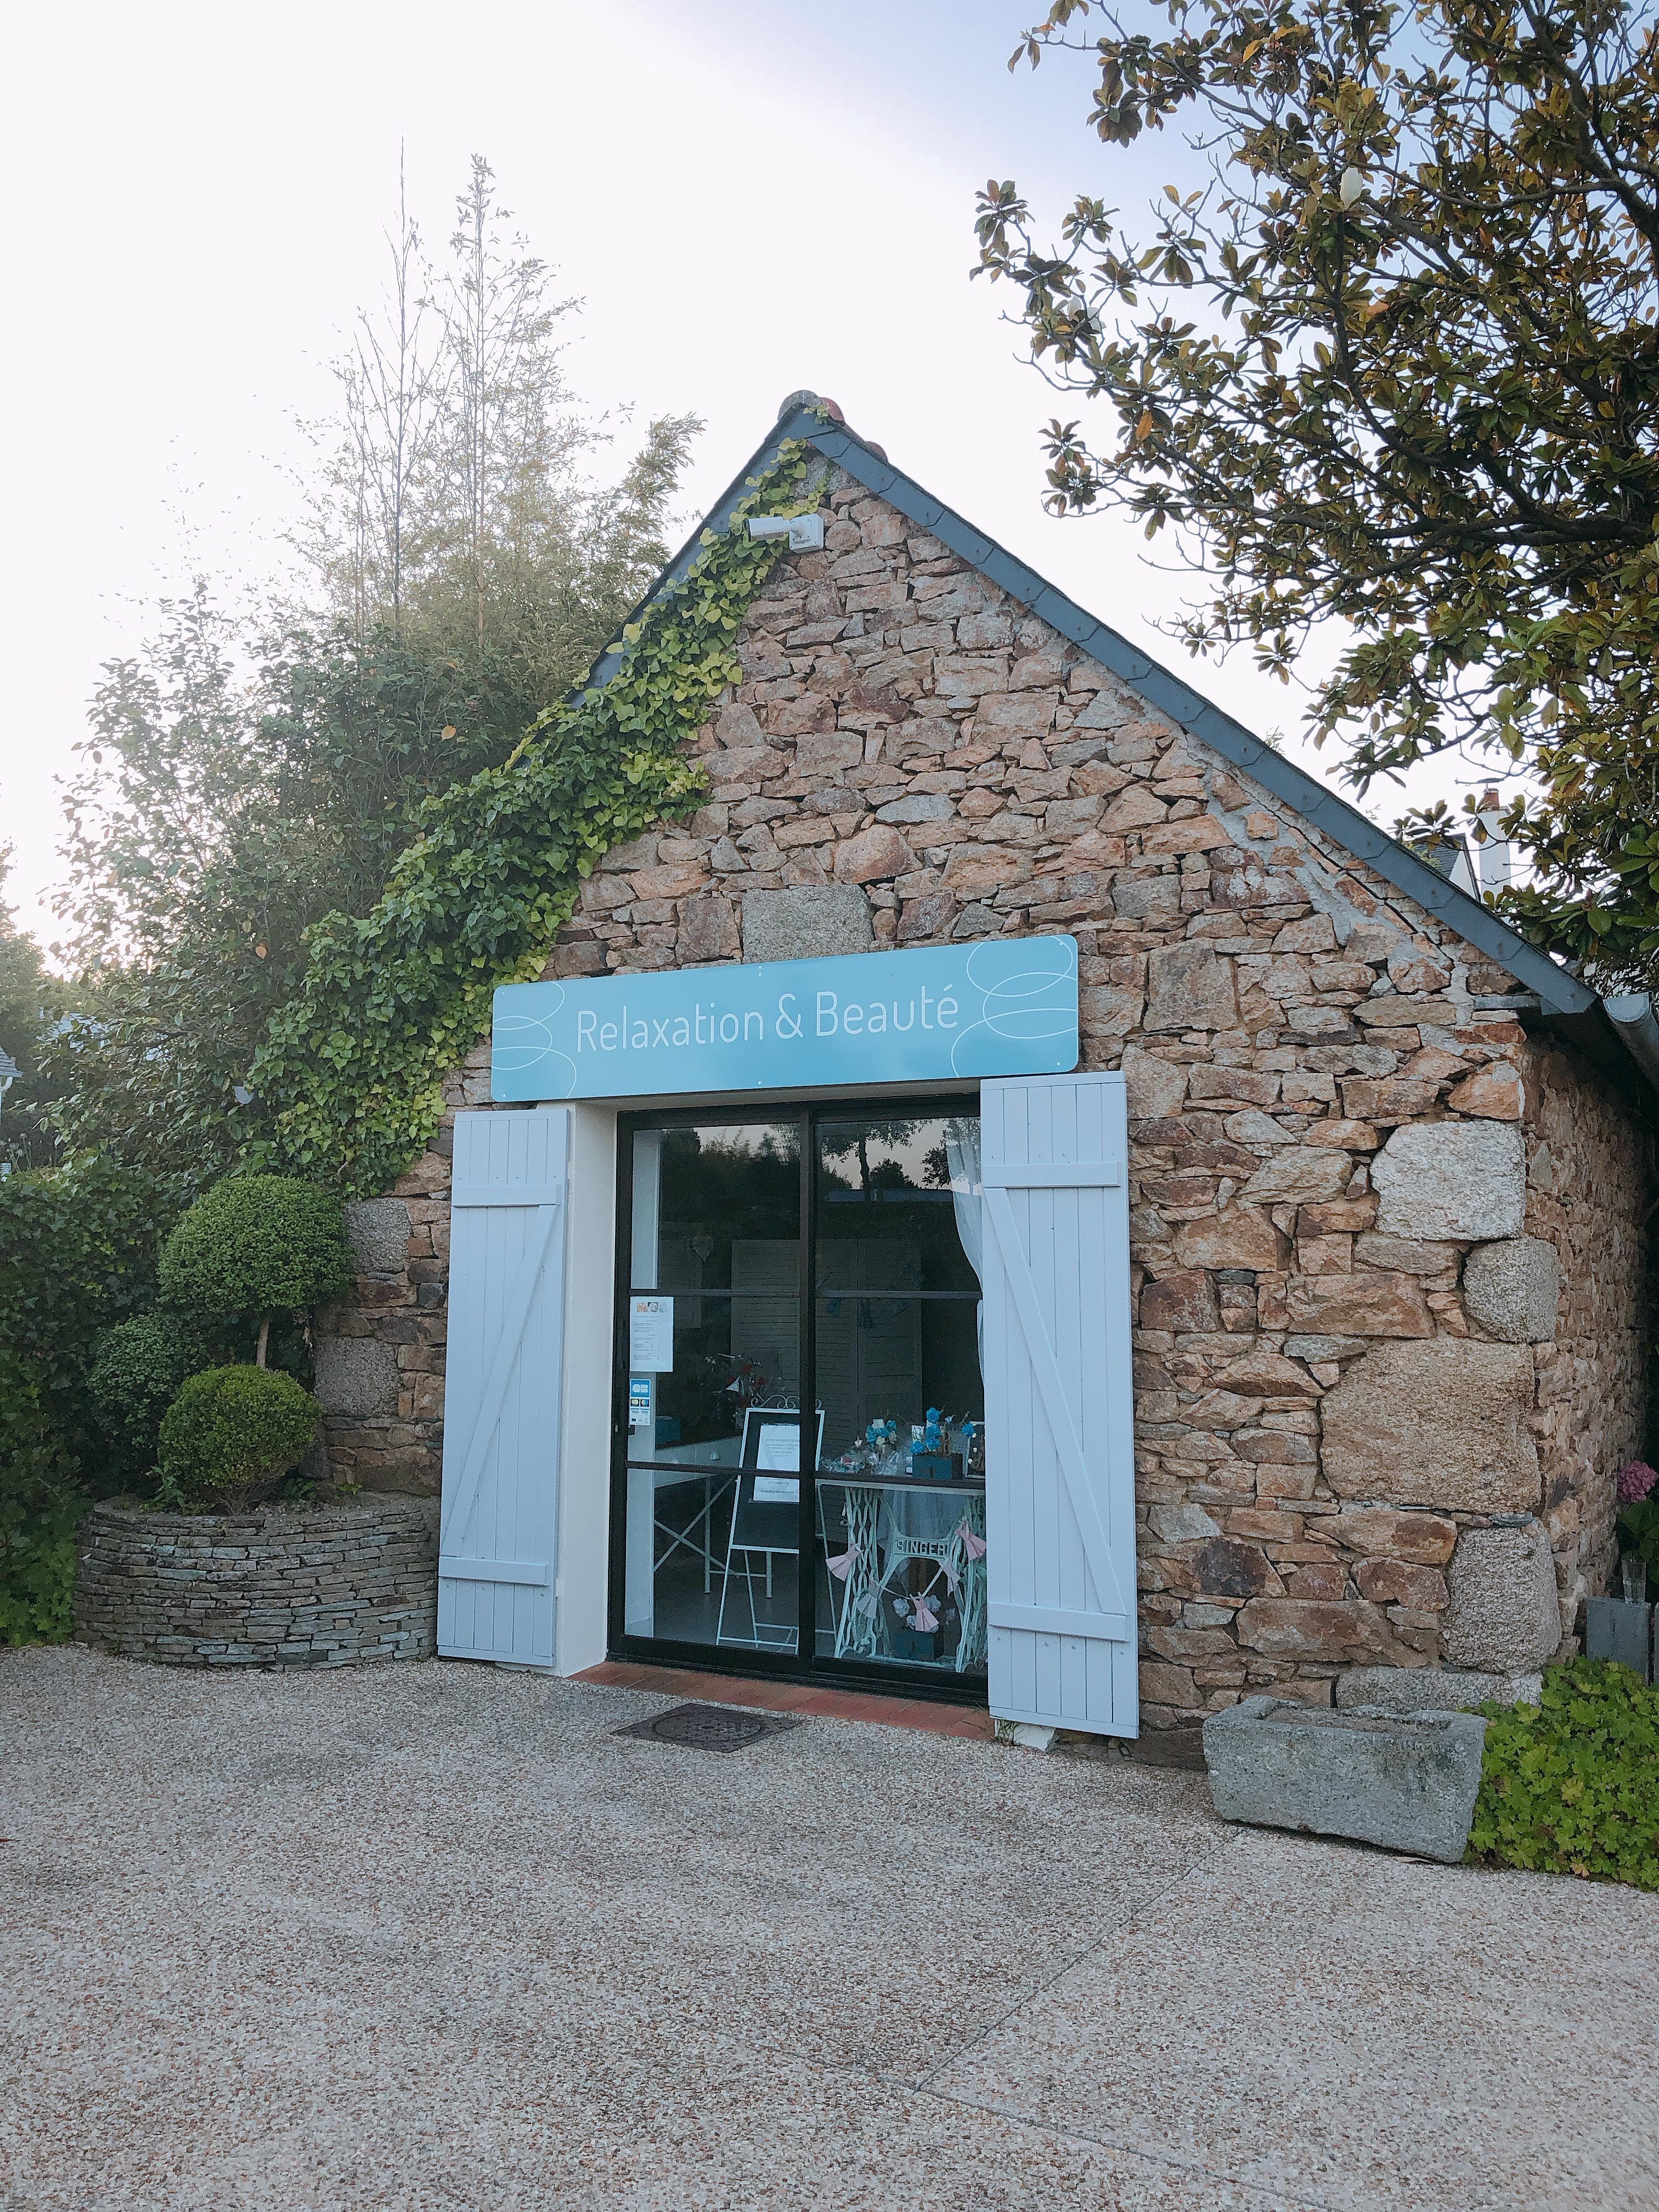 IMG 9368 3024x4032 - Fotodagboek Vakantie: Camping Les Mouettes, Bretagne!